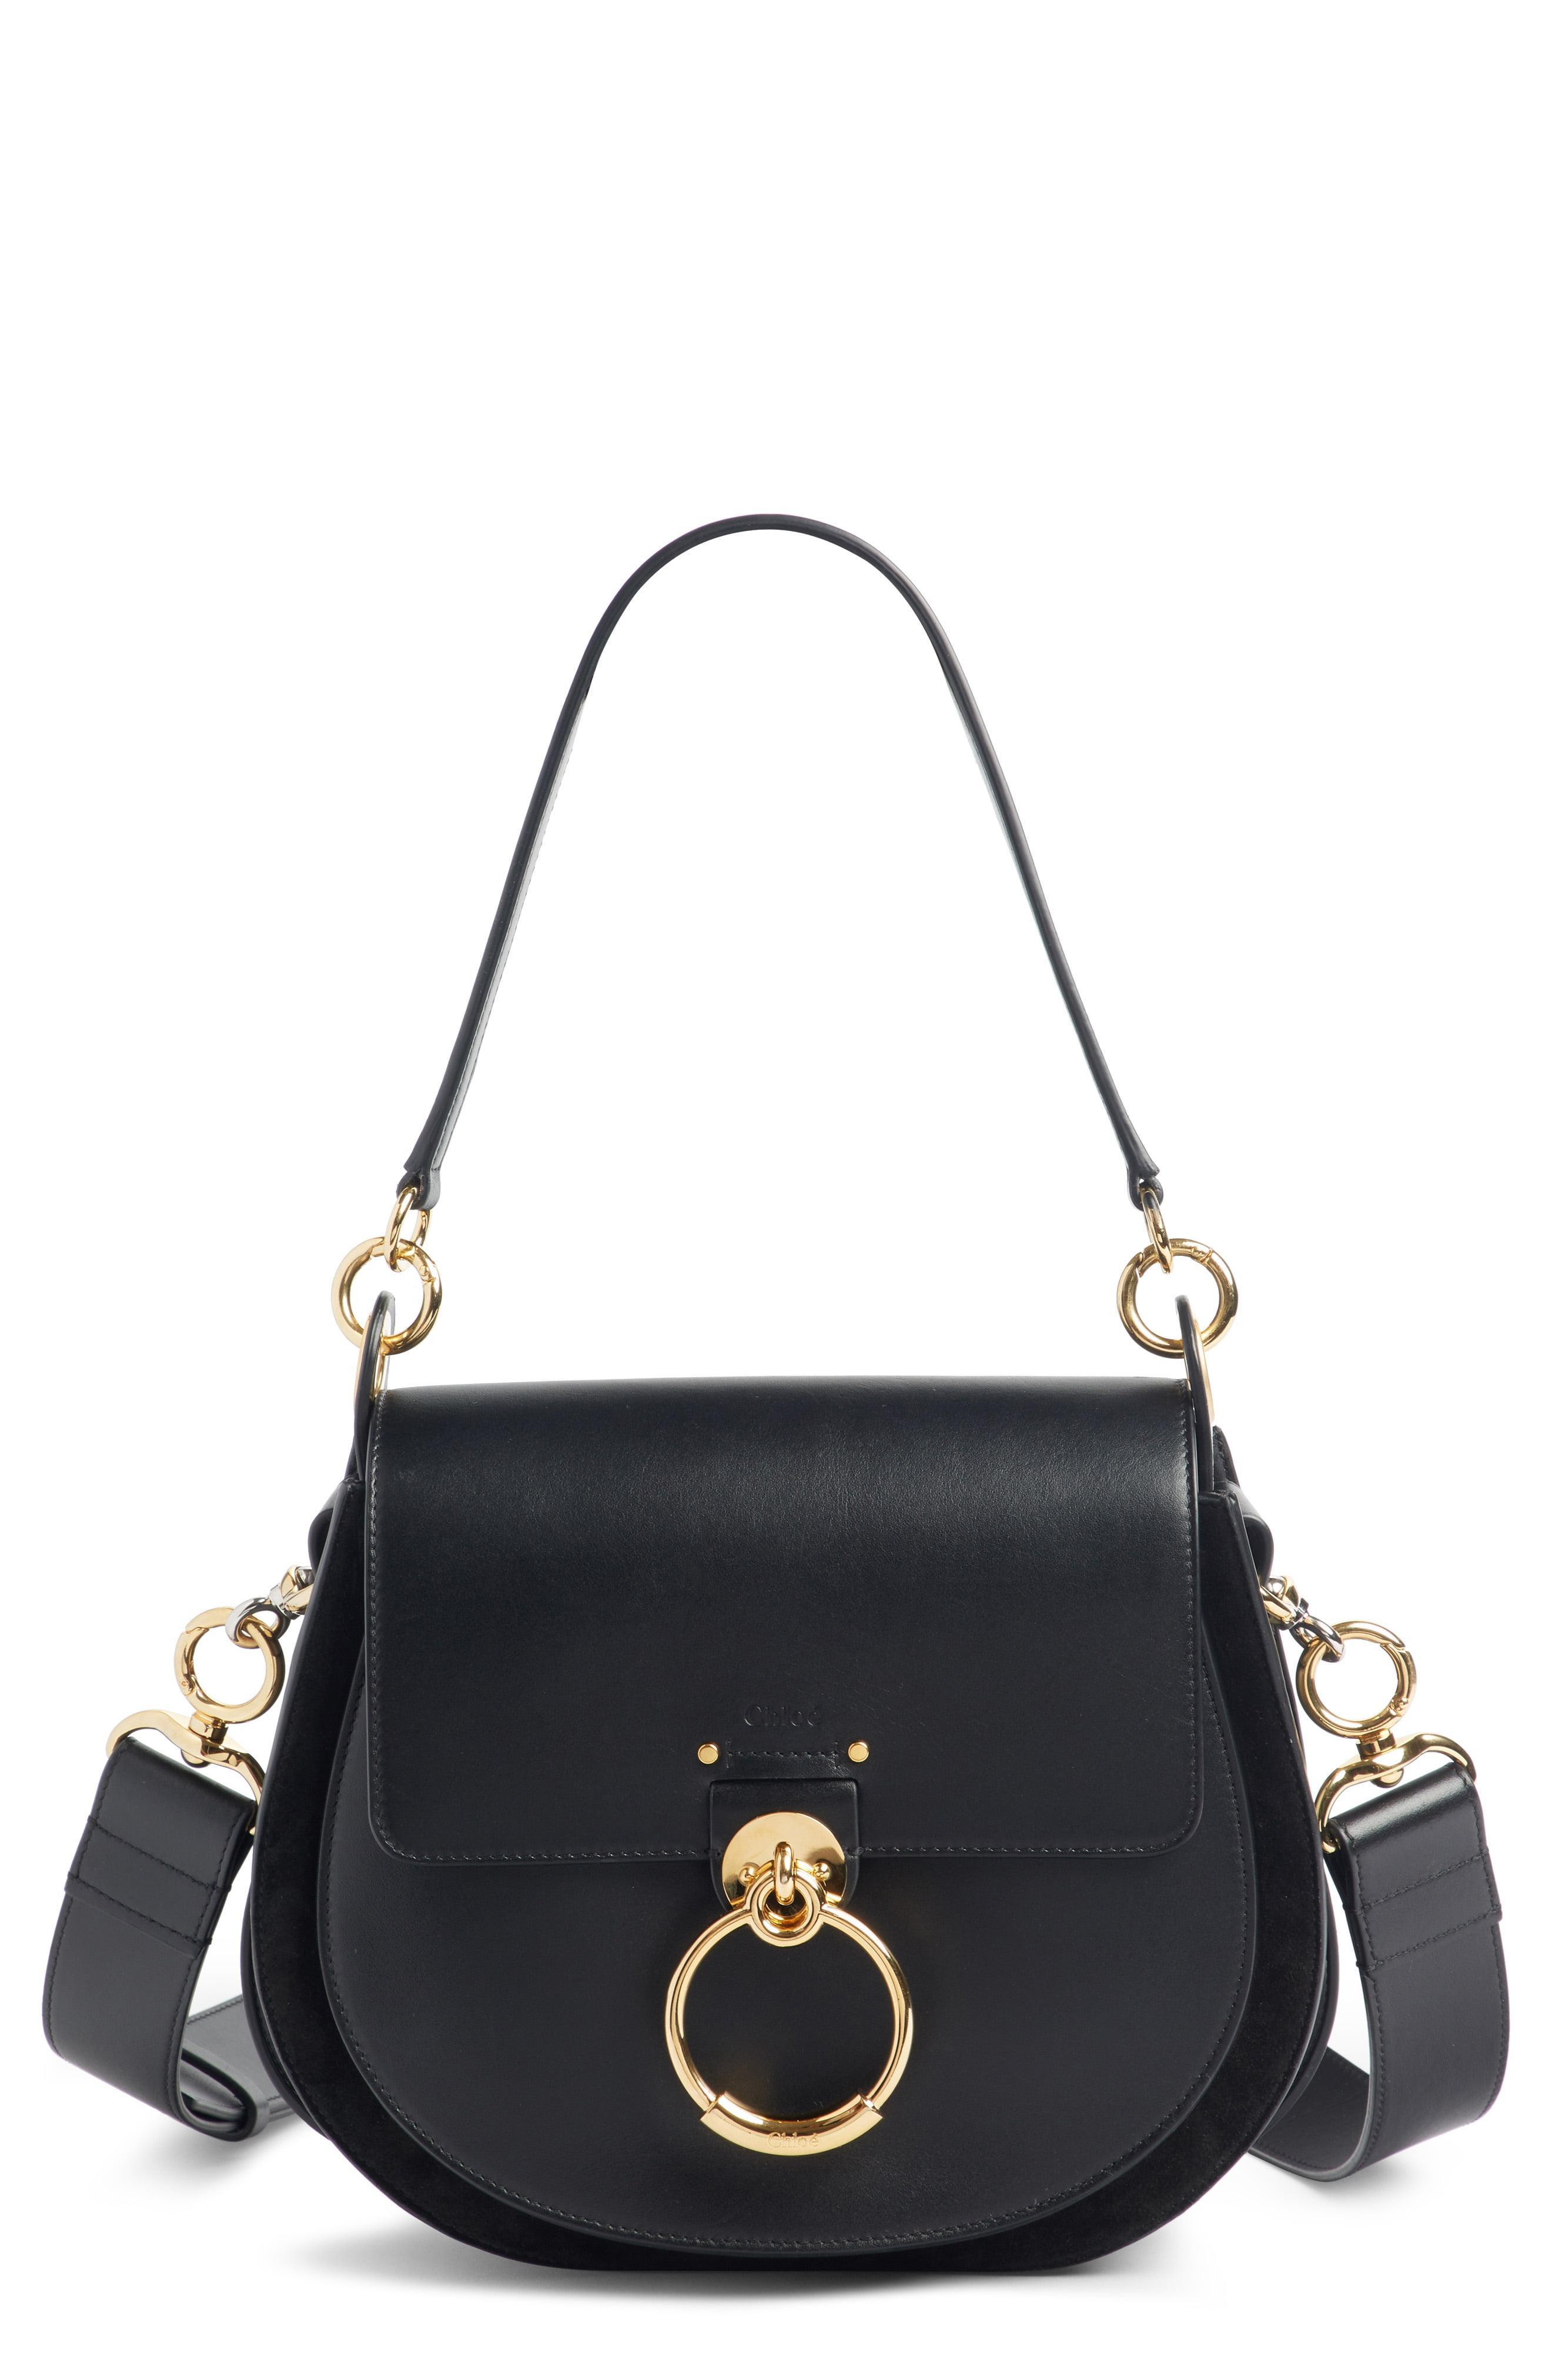 c74b862fbf94 Lyst - Chloé Medium Tess Calfskin Leather Shoulder Bag in Black